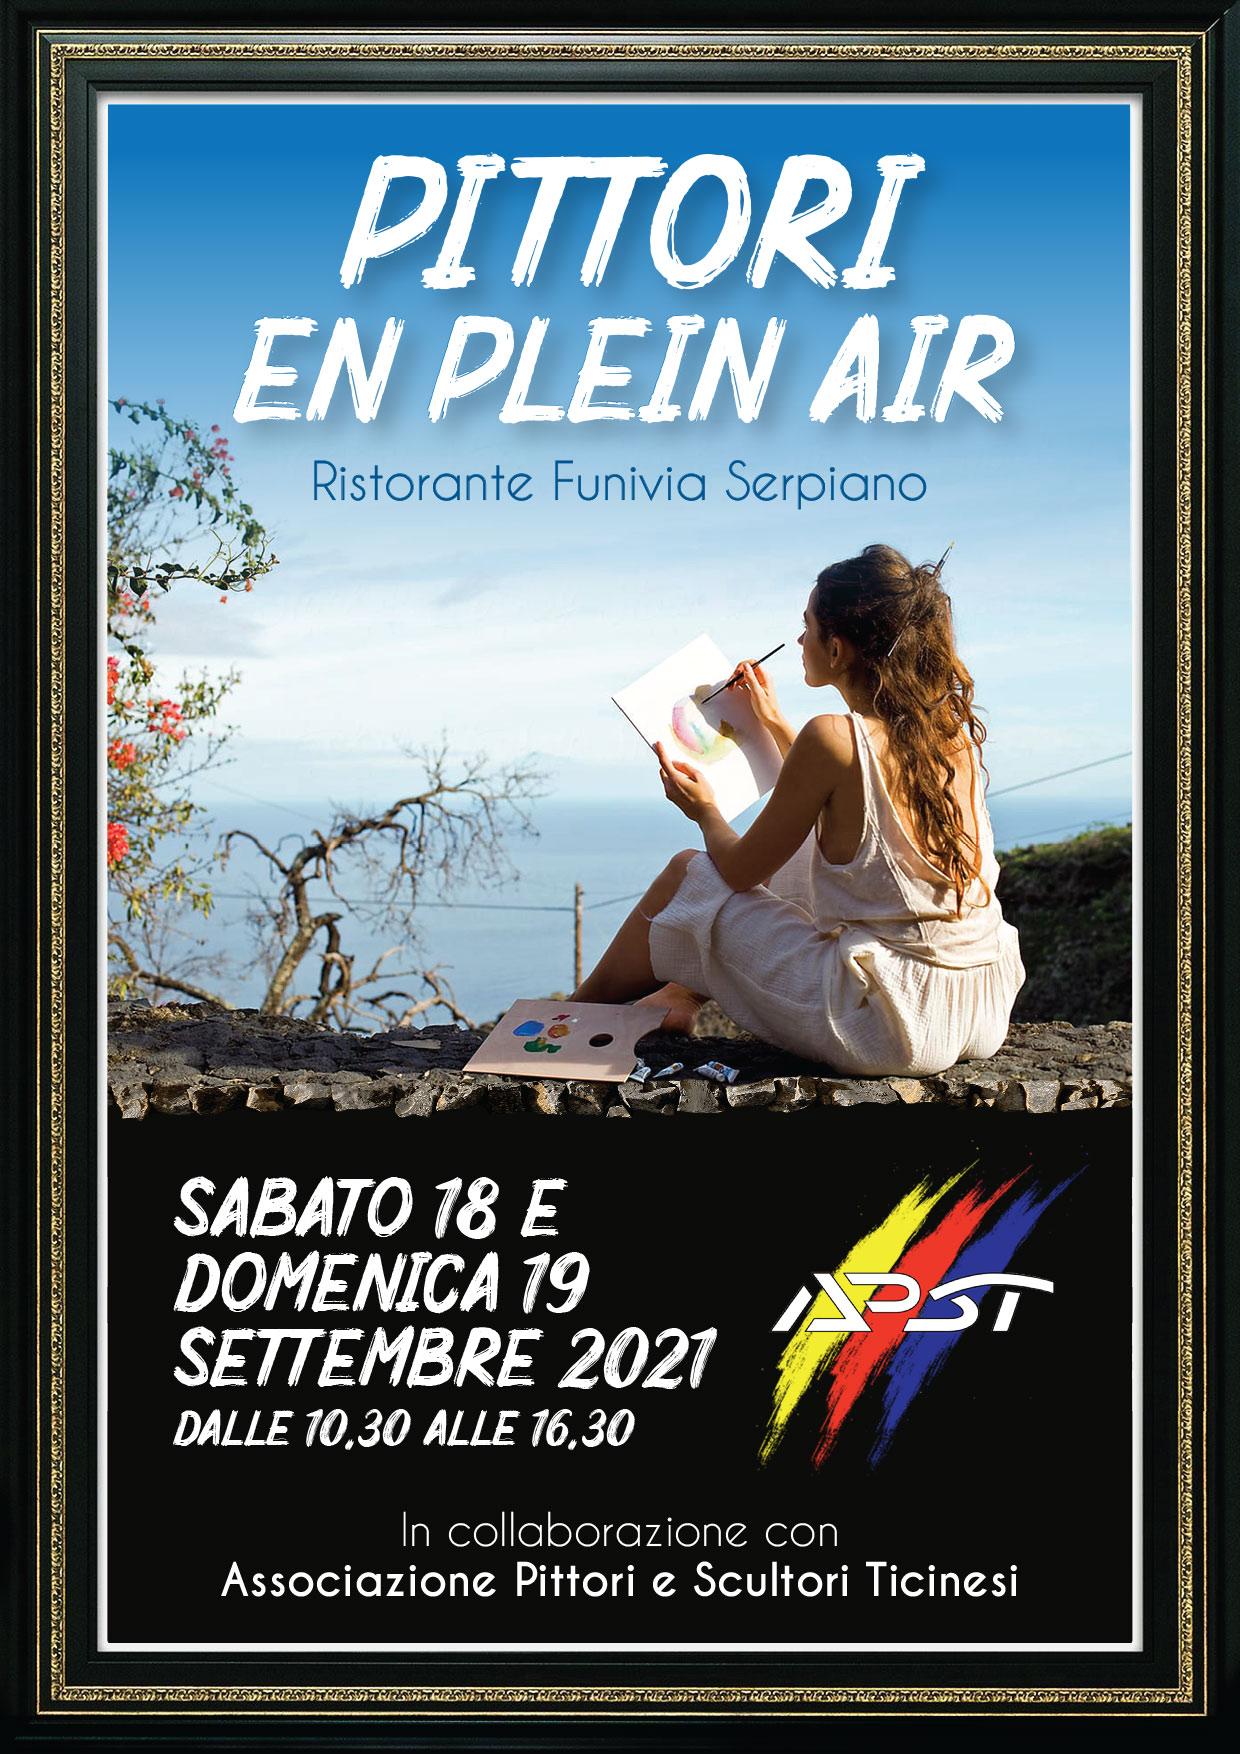 Pittori-En-Plein-Air-SET21